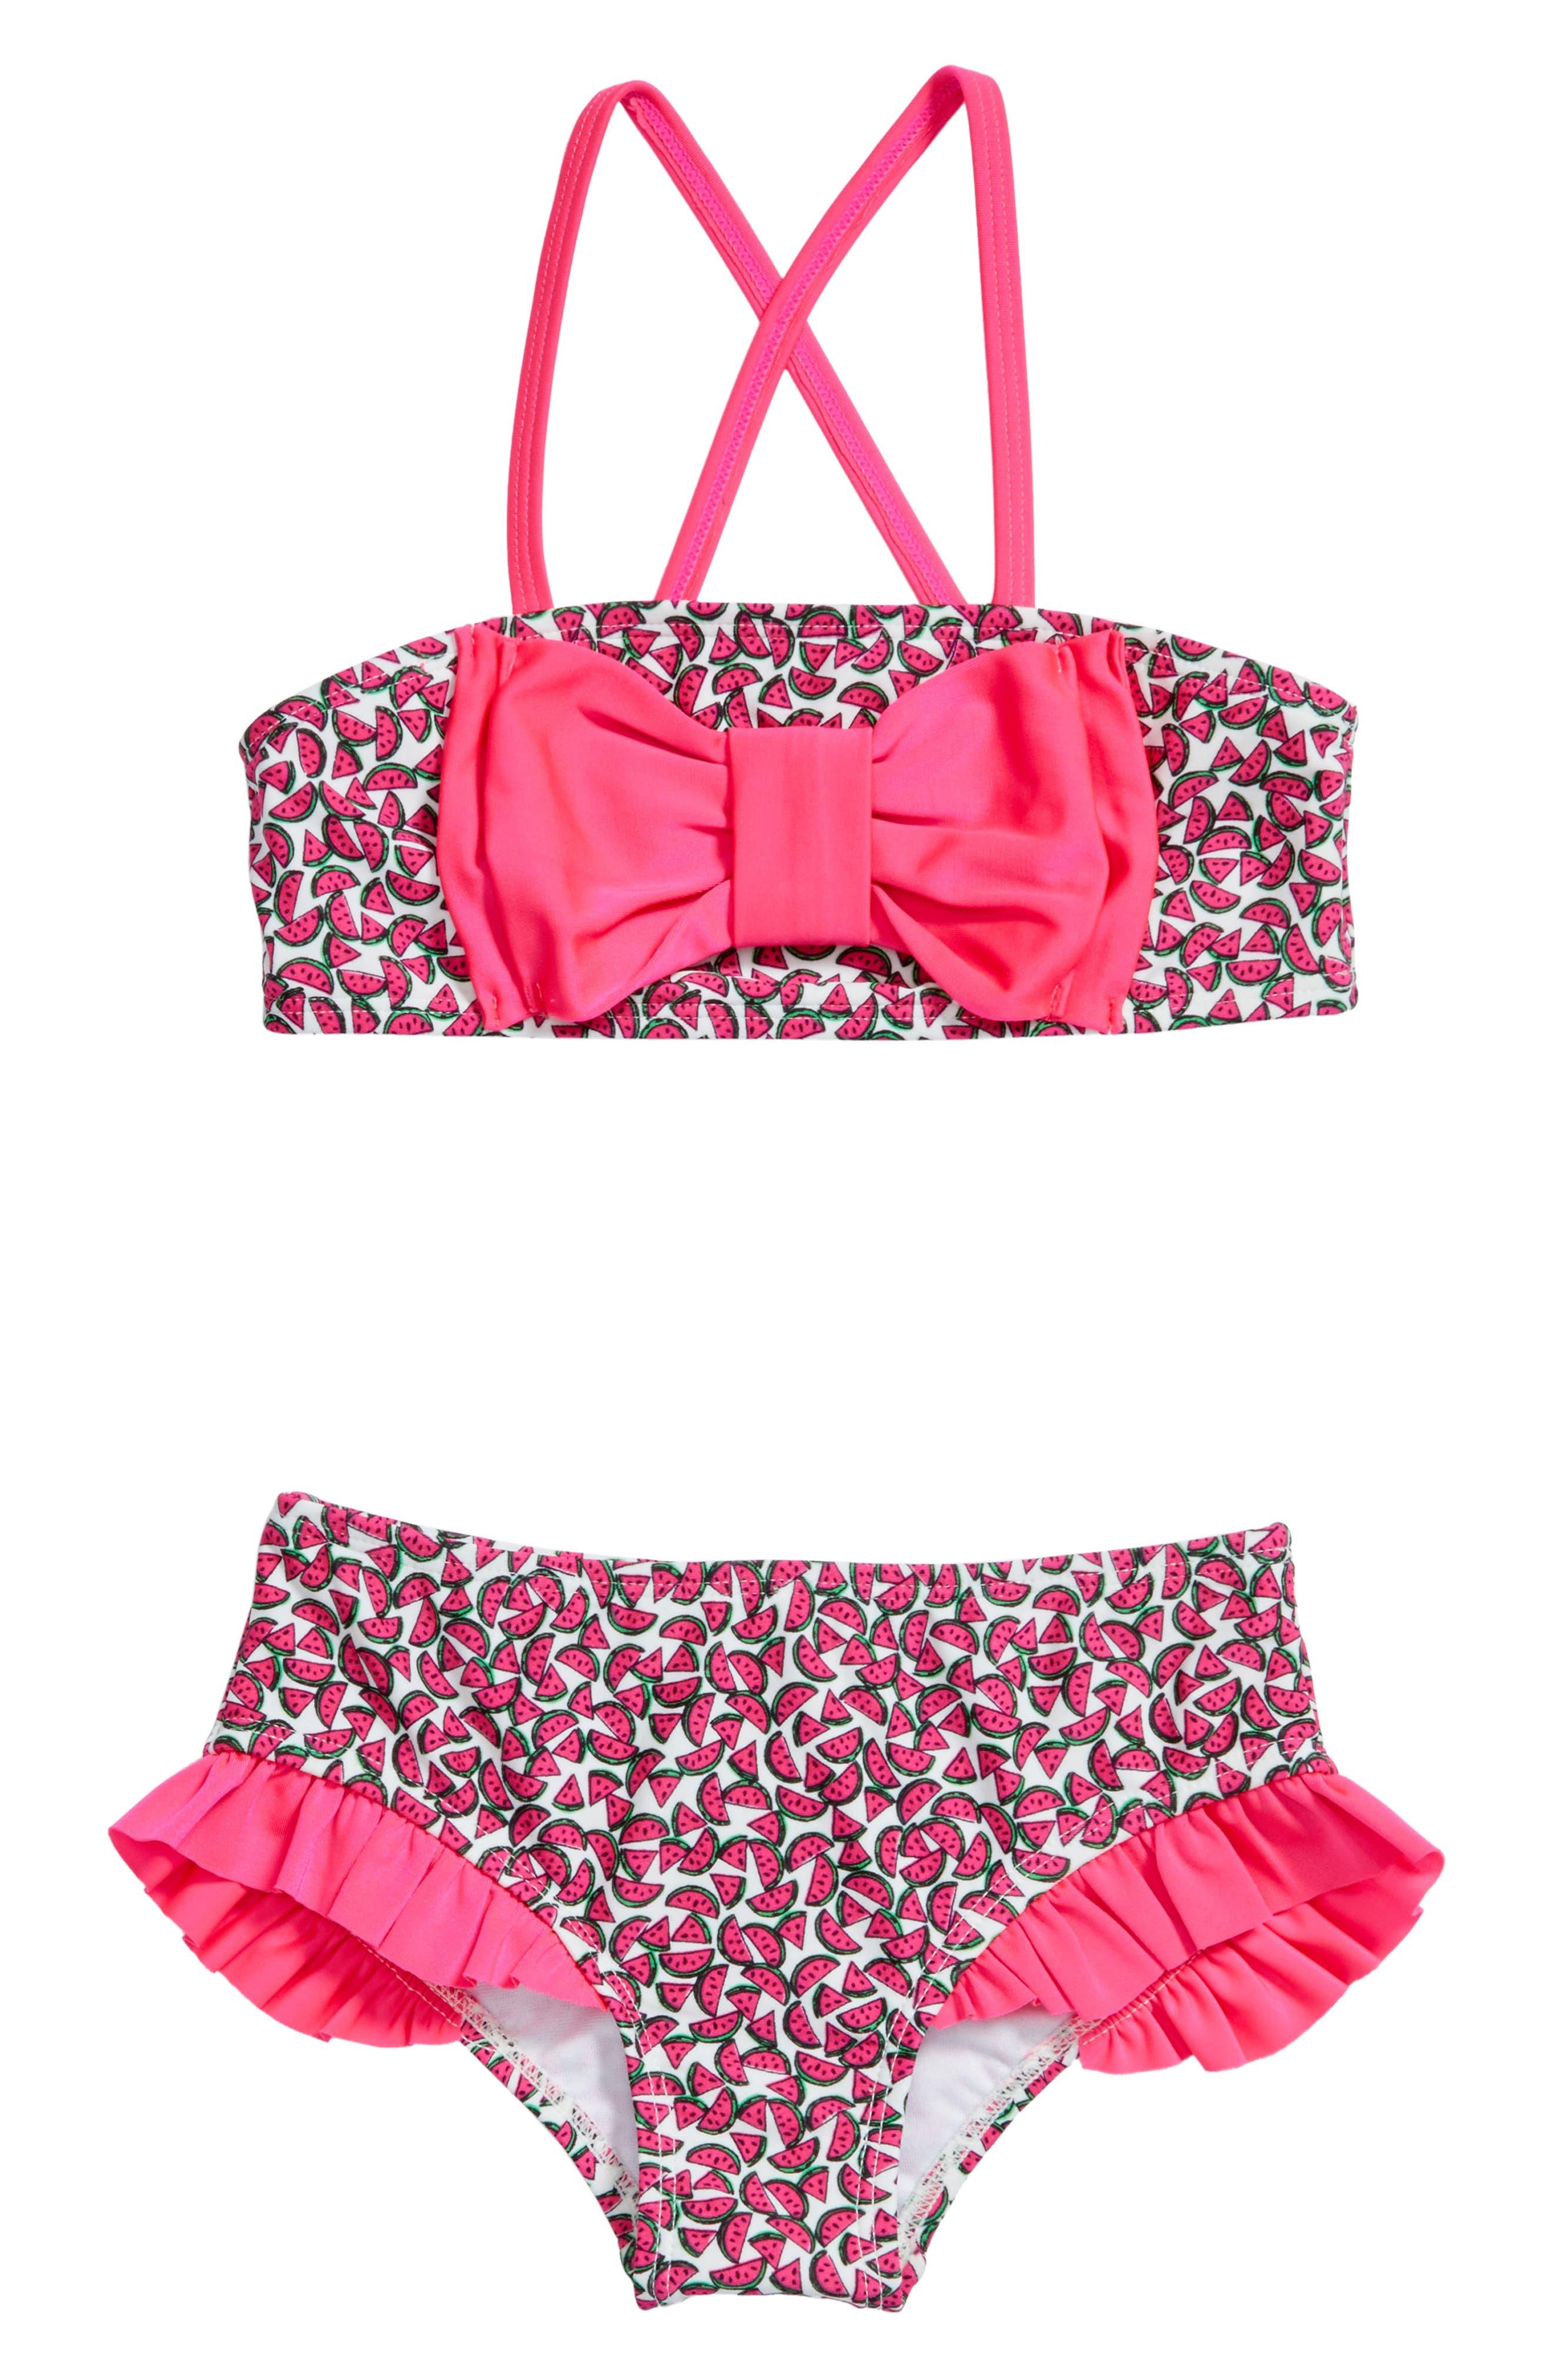 Watermelon Two-Piece Swimsuit,                             Main thumbnail 1, color,                             Cream/ Multi